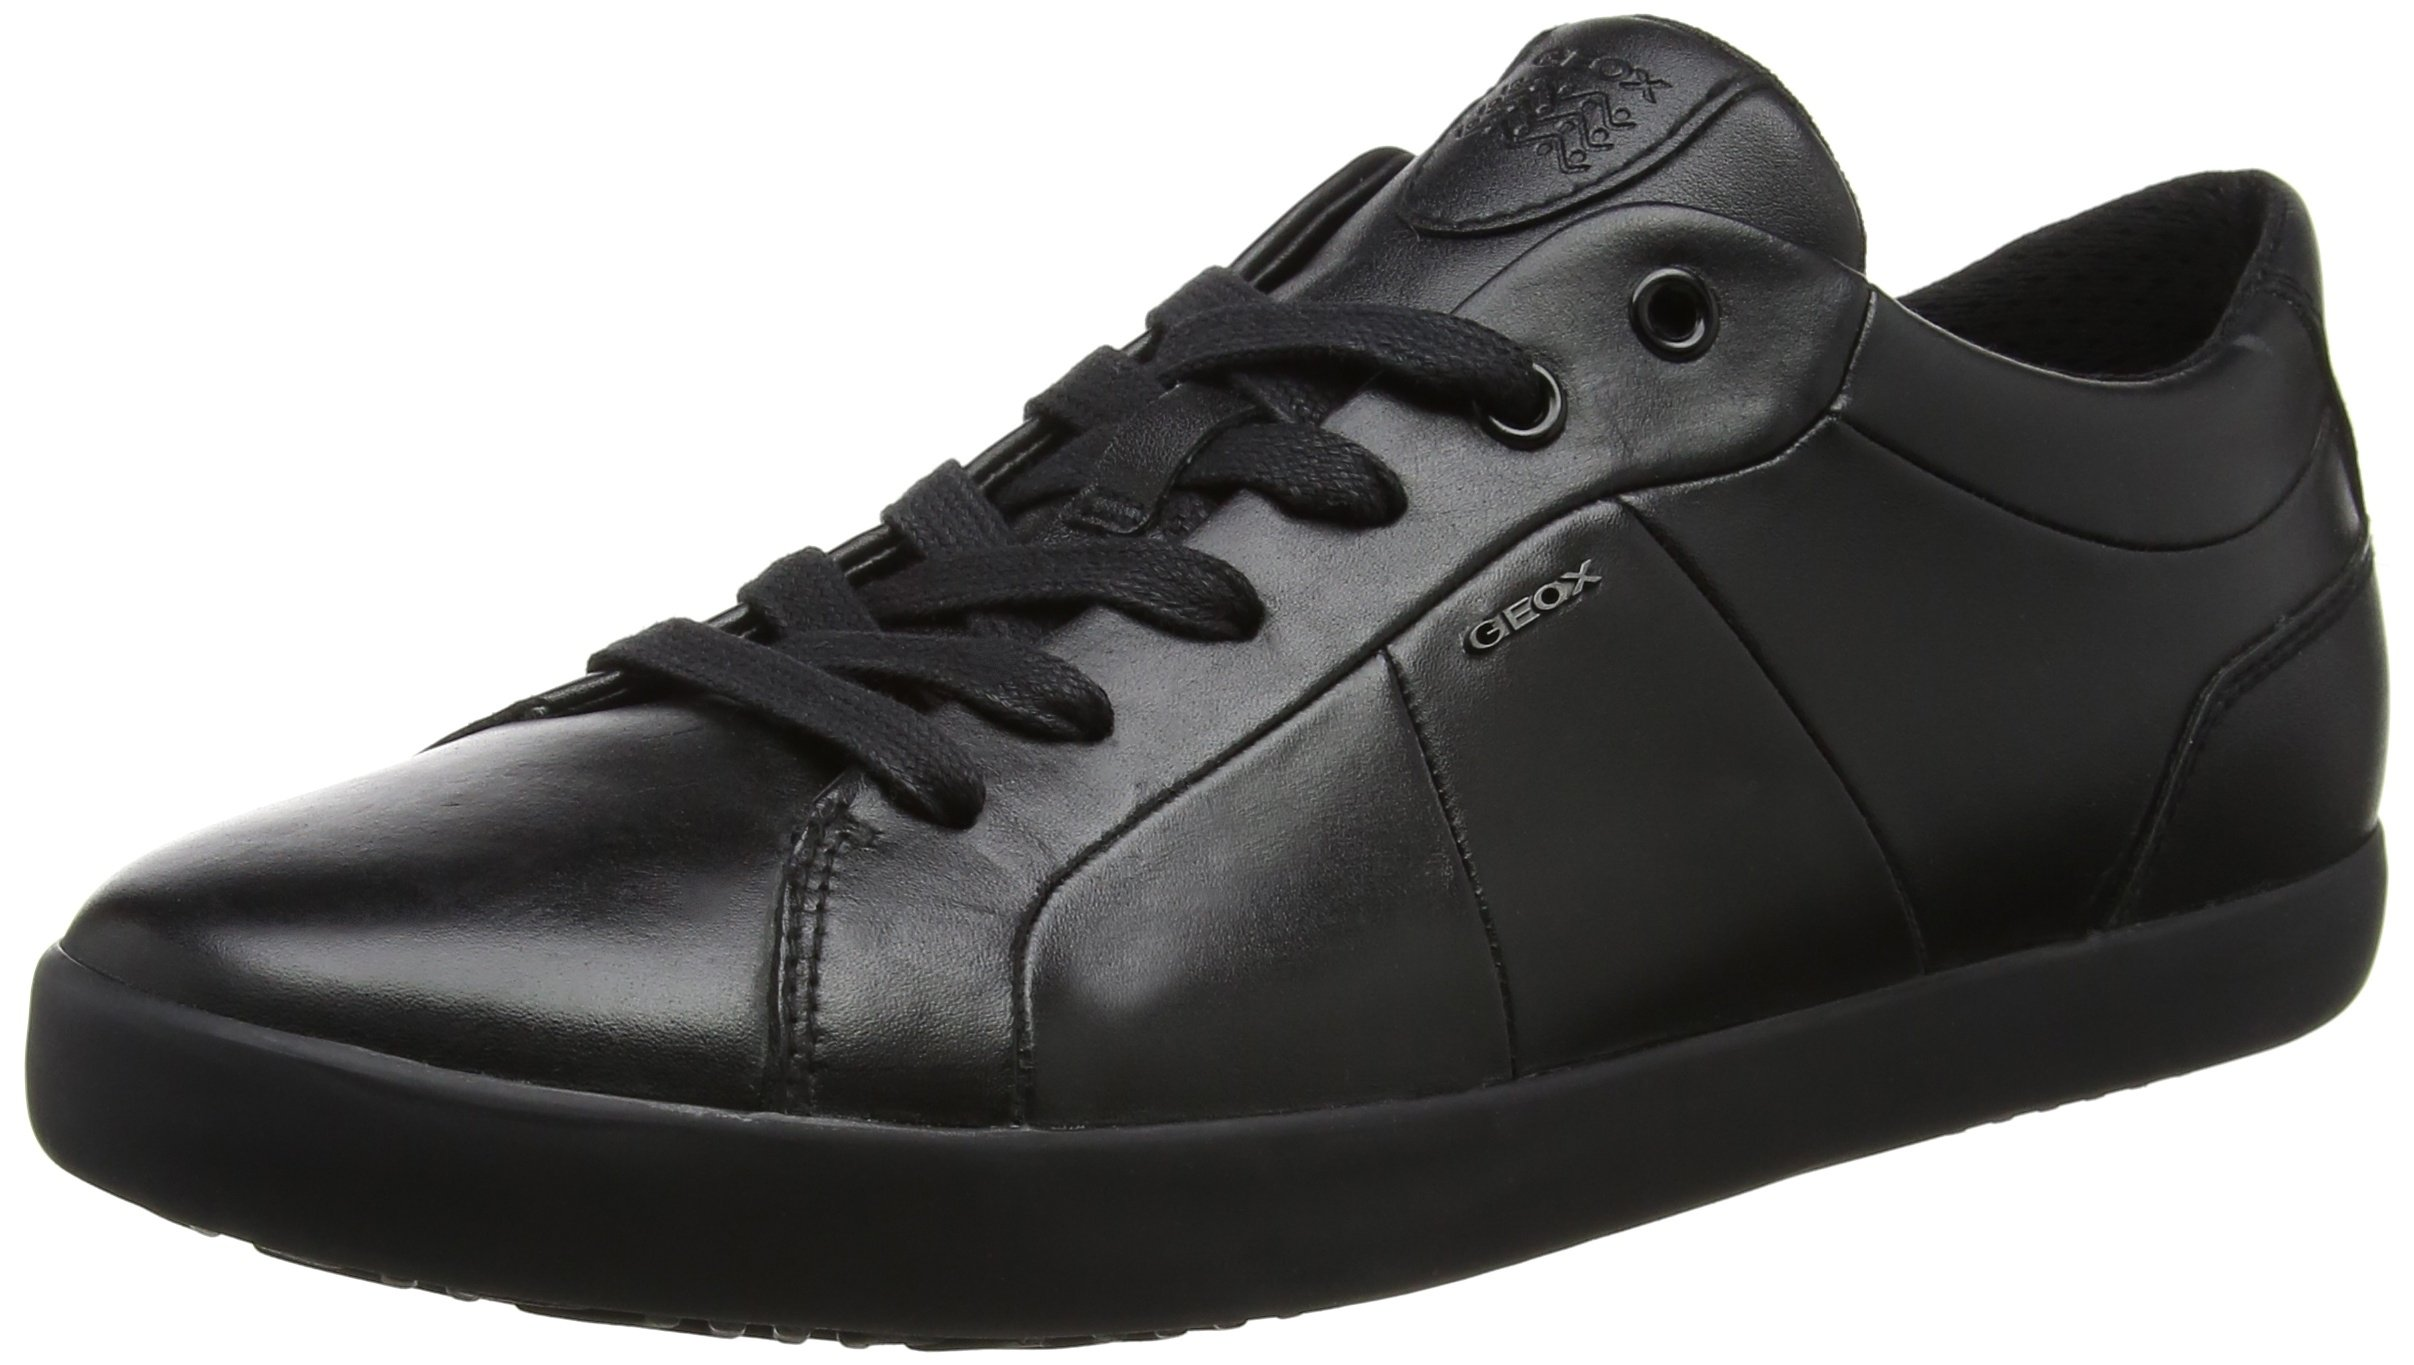 Geox Basses U Smart BSneakers HommeNoirblack42 Eu gb67yf